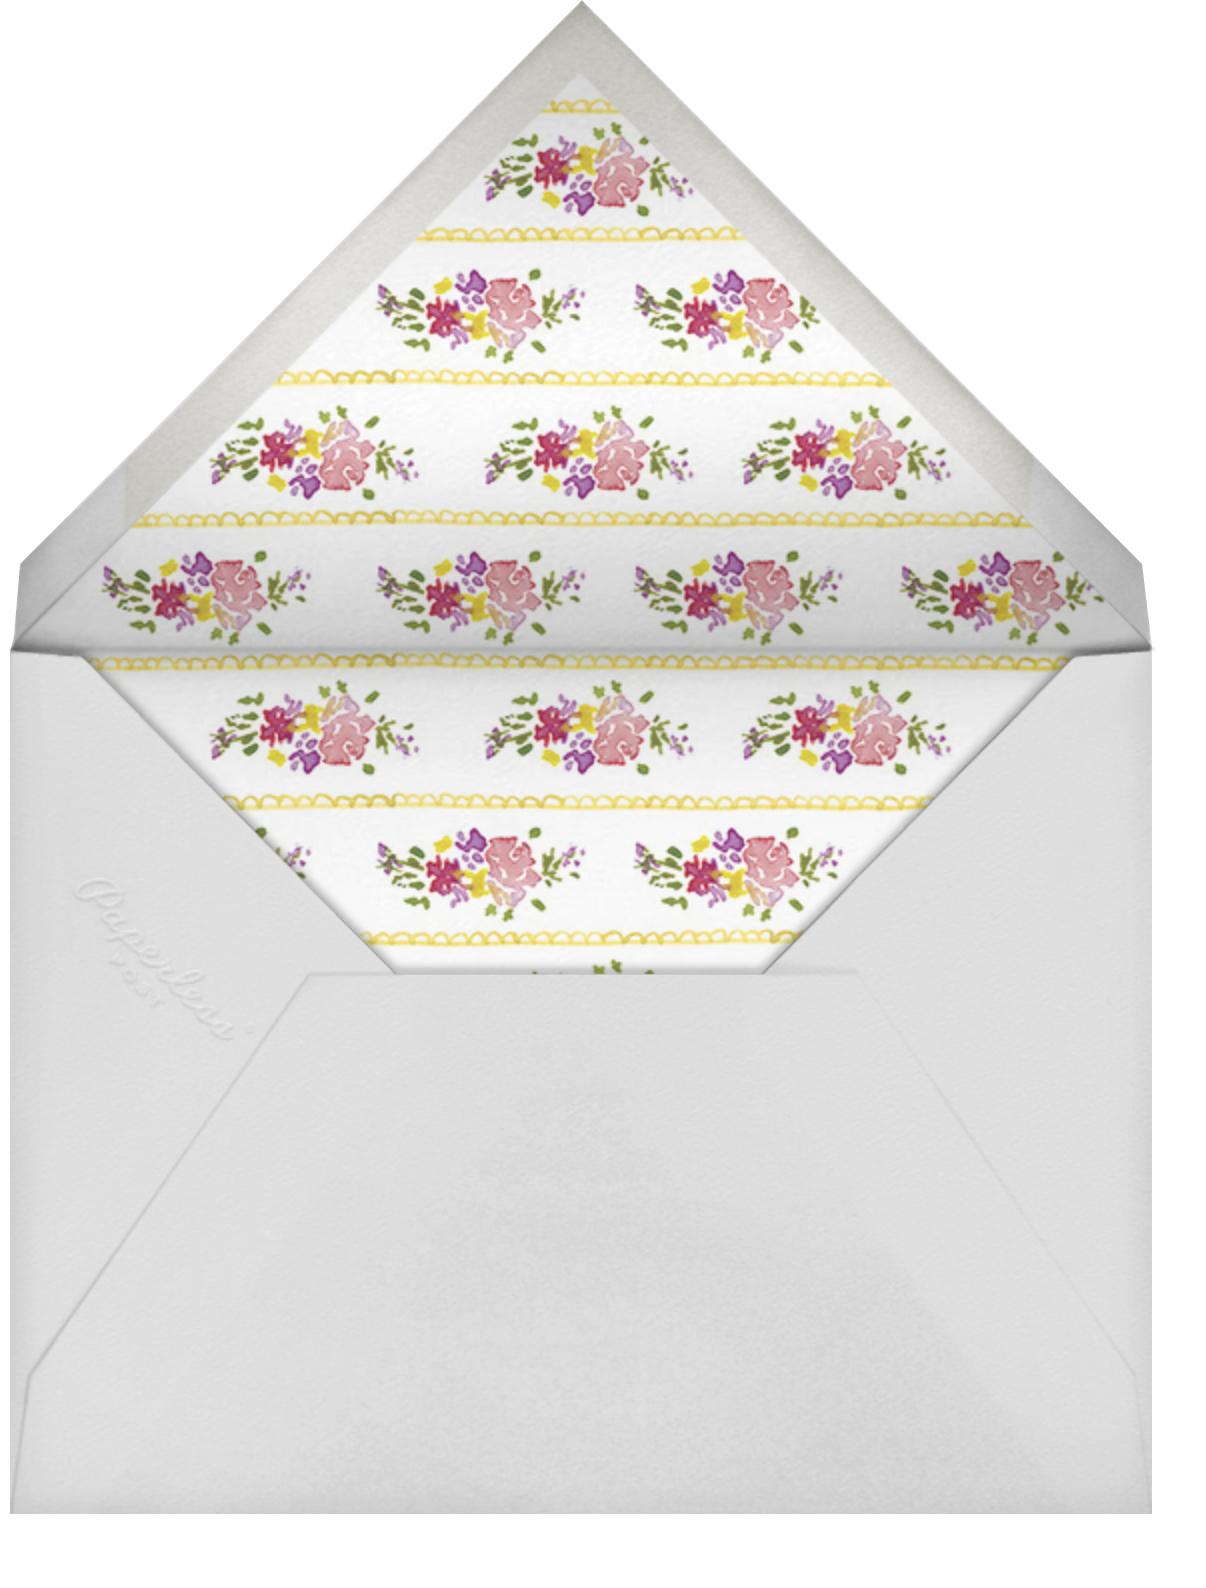 Petits Fours Secs - Paperless Post - Envelope